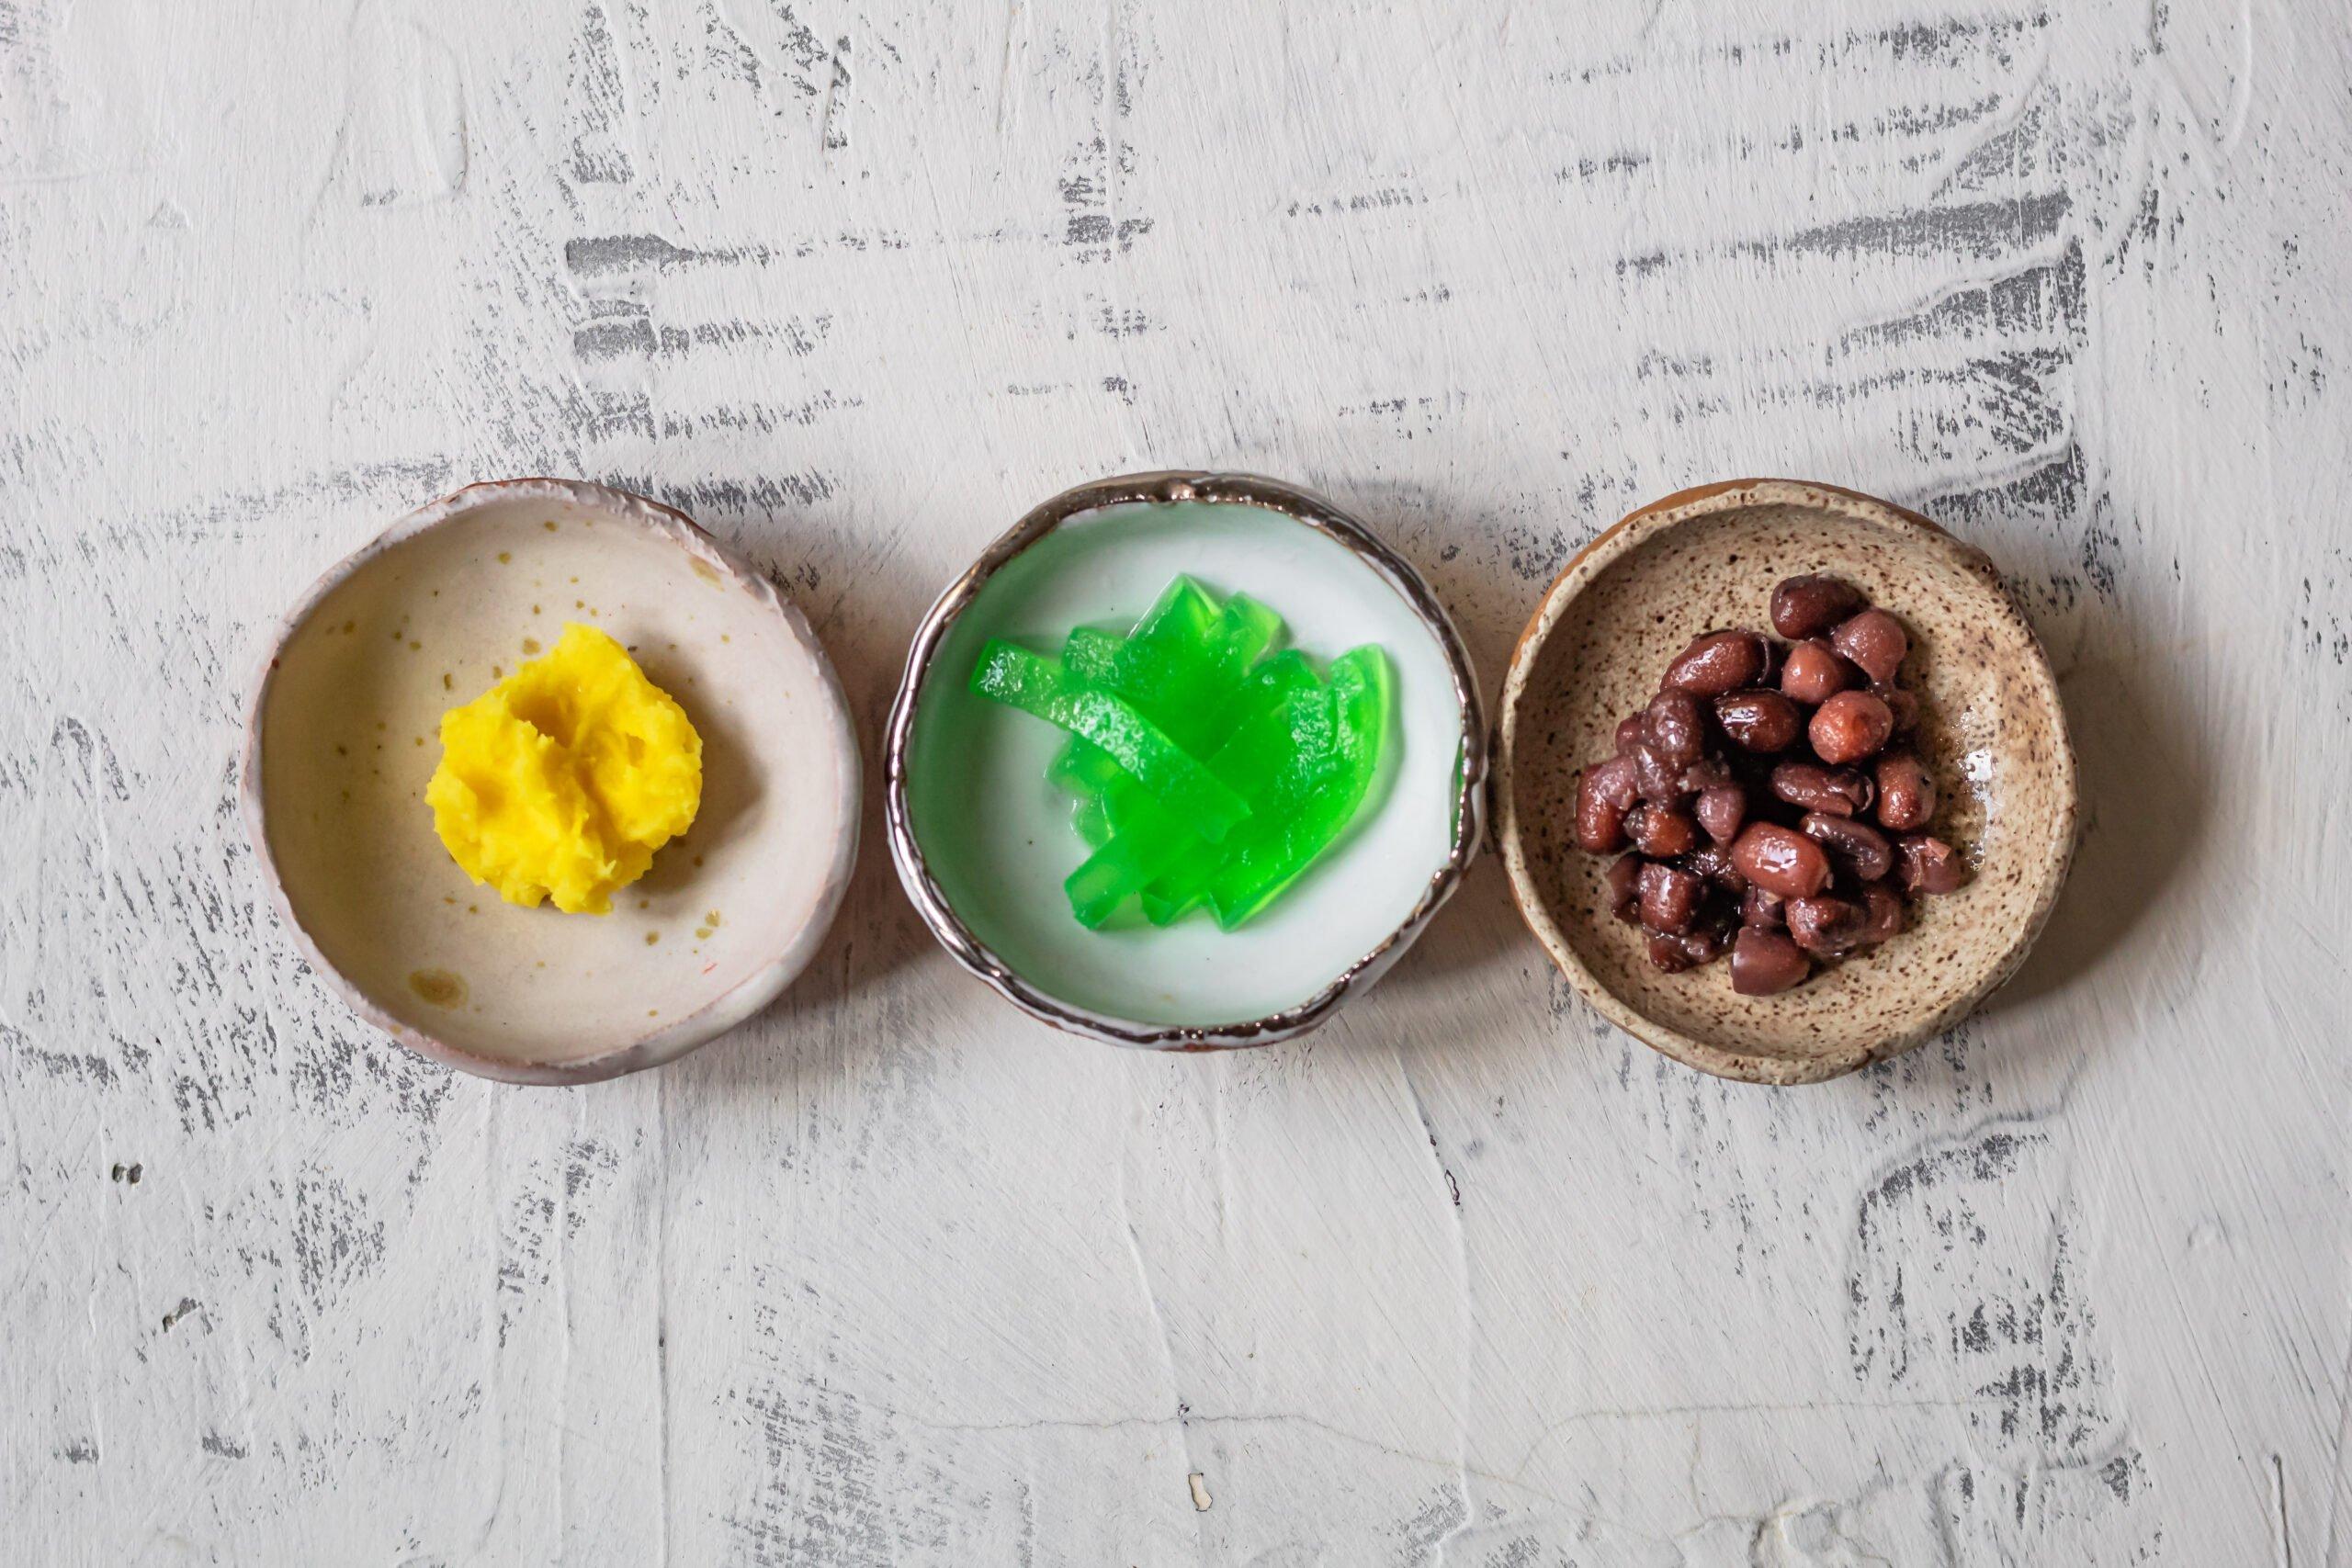 mung beans, pandan jelly, and adzuki beans